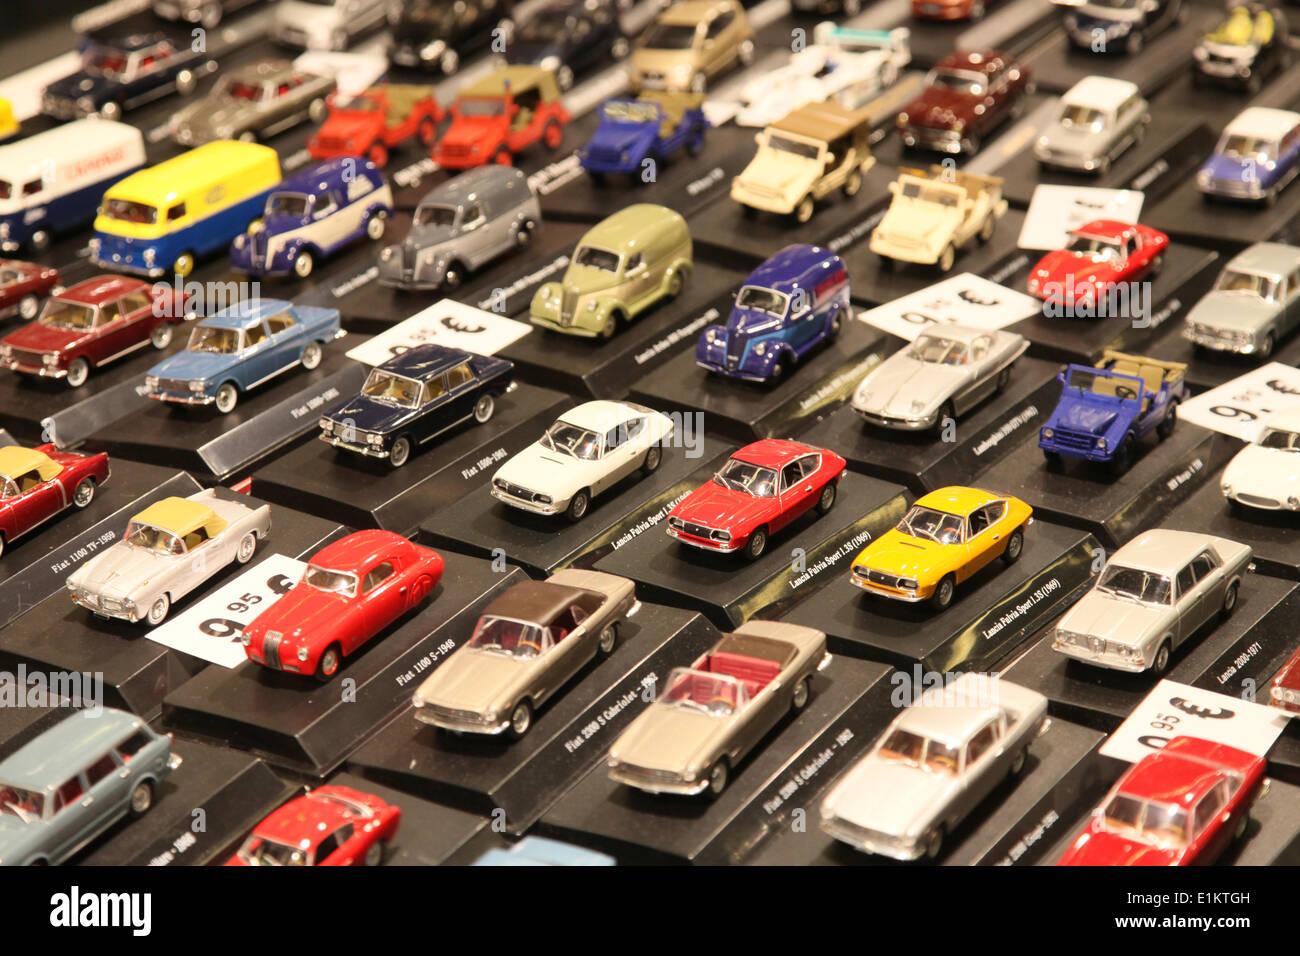 Vintage car show - miniature cars Stock Photo: 69892497 - Alamy